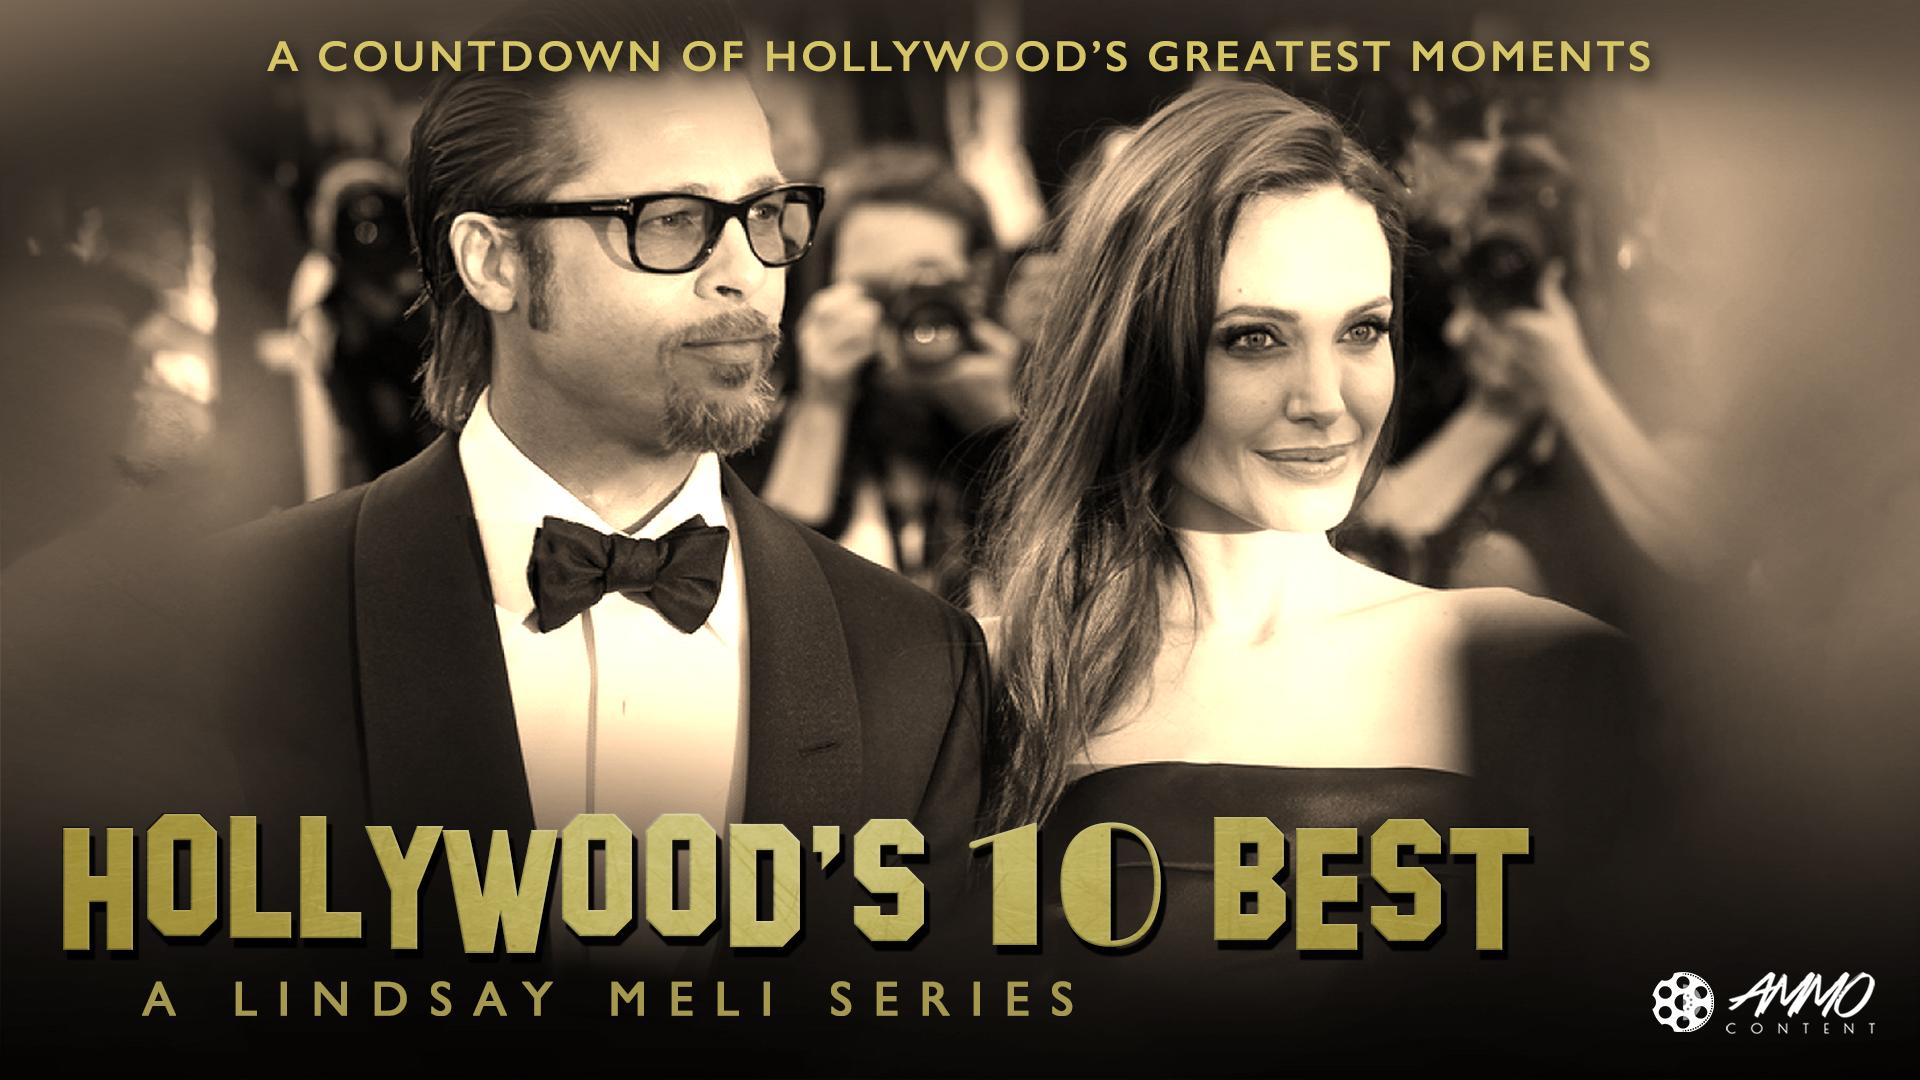 Hollywood's 10 Best